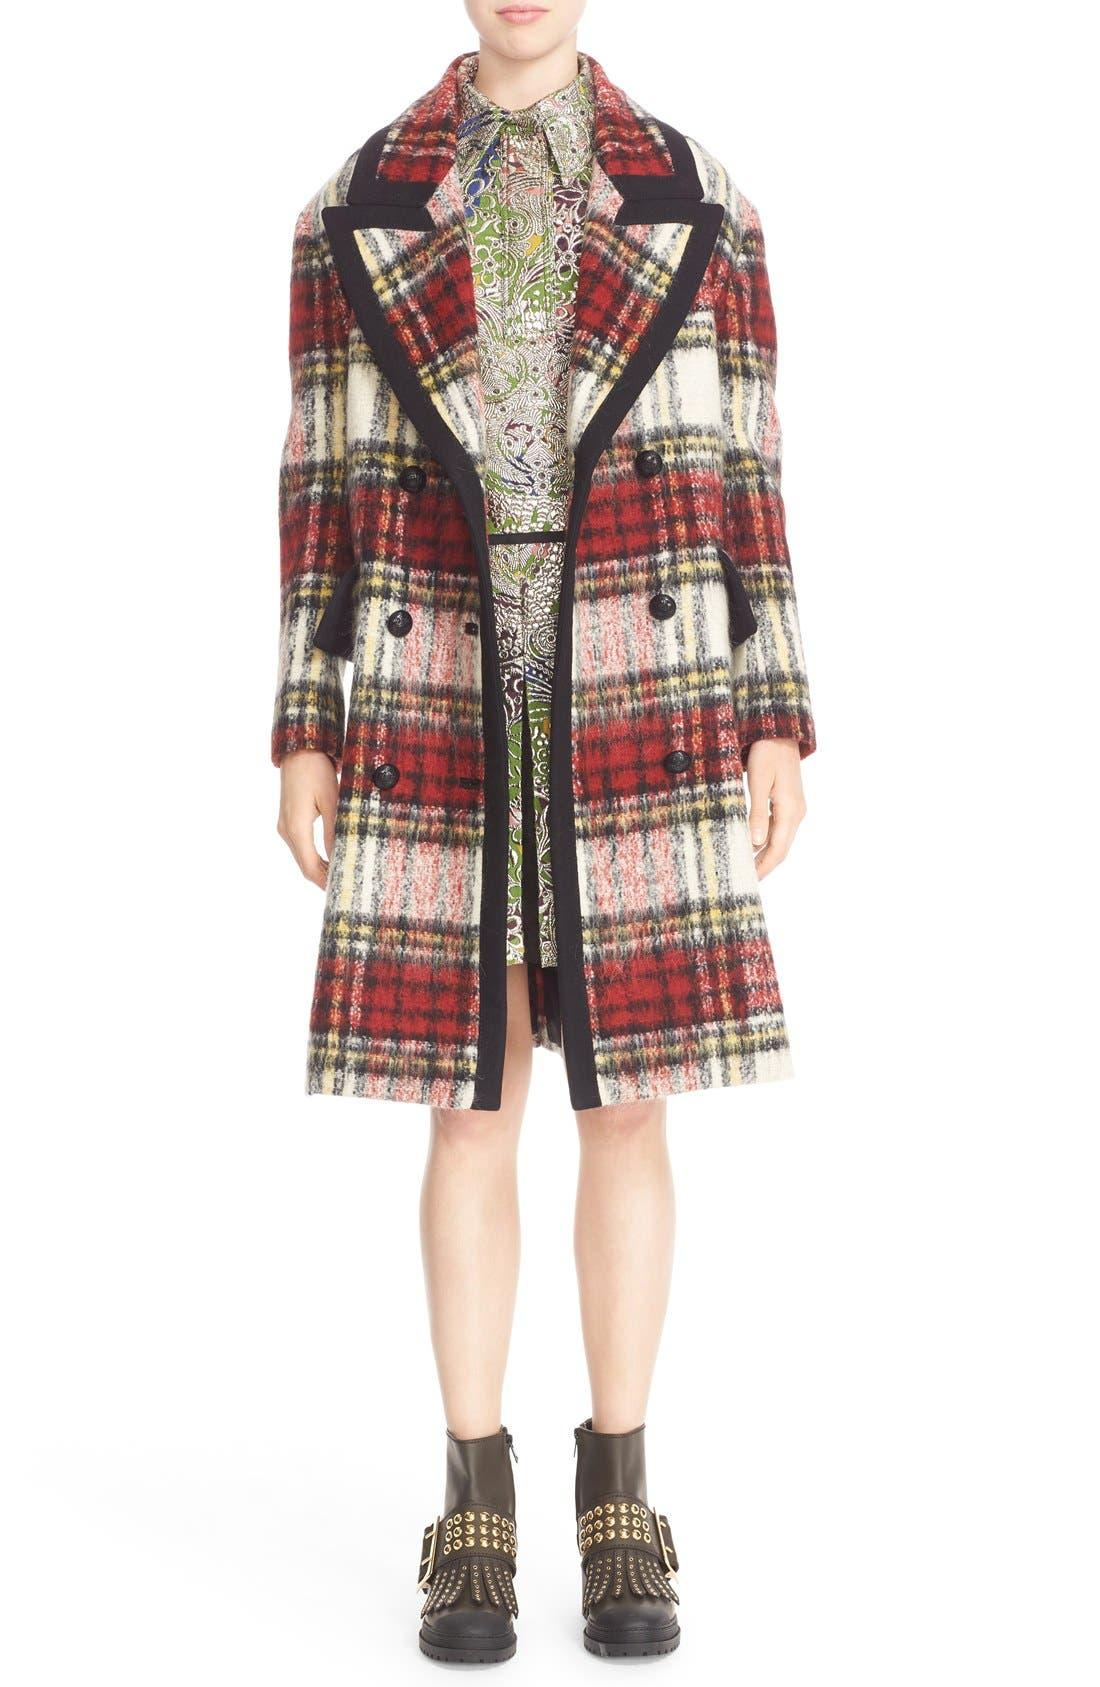 BURBERRY PRORSUM,                             Tartan Plaid Wool Blend Coat,                             Alternate thumbnail 6, color,                             930